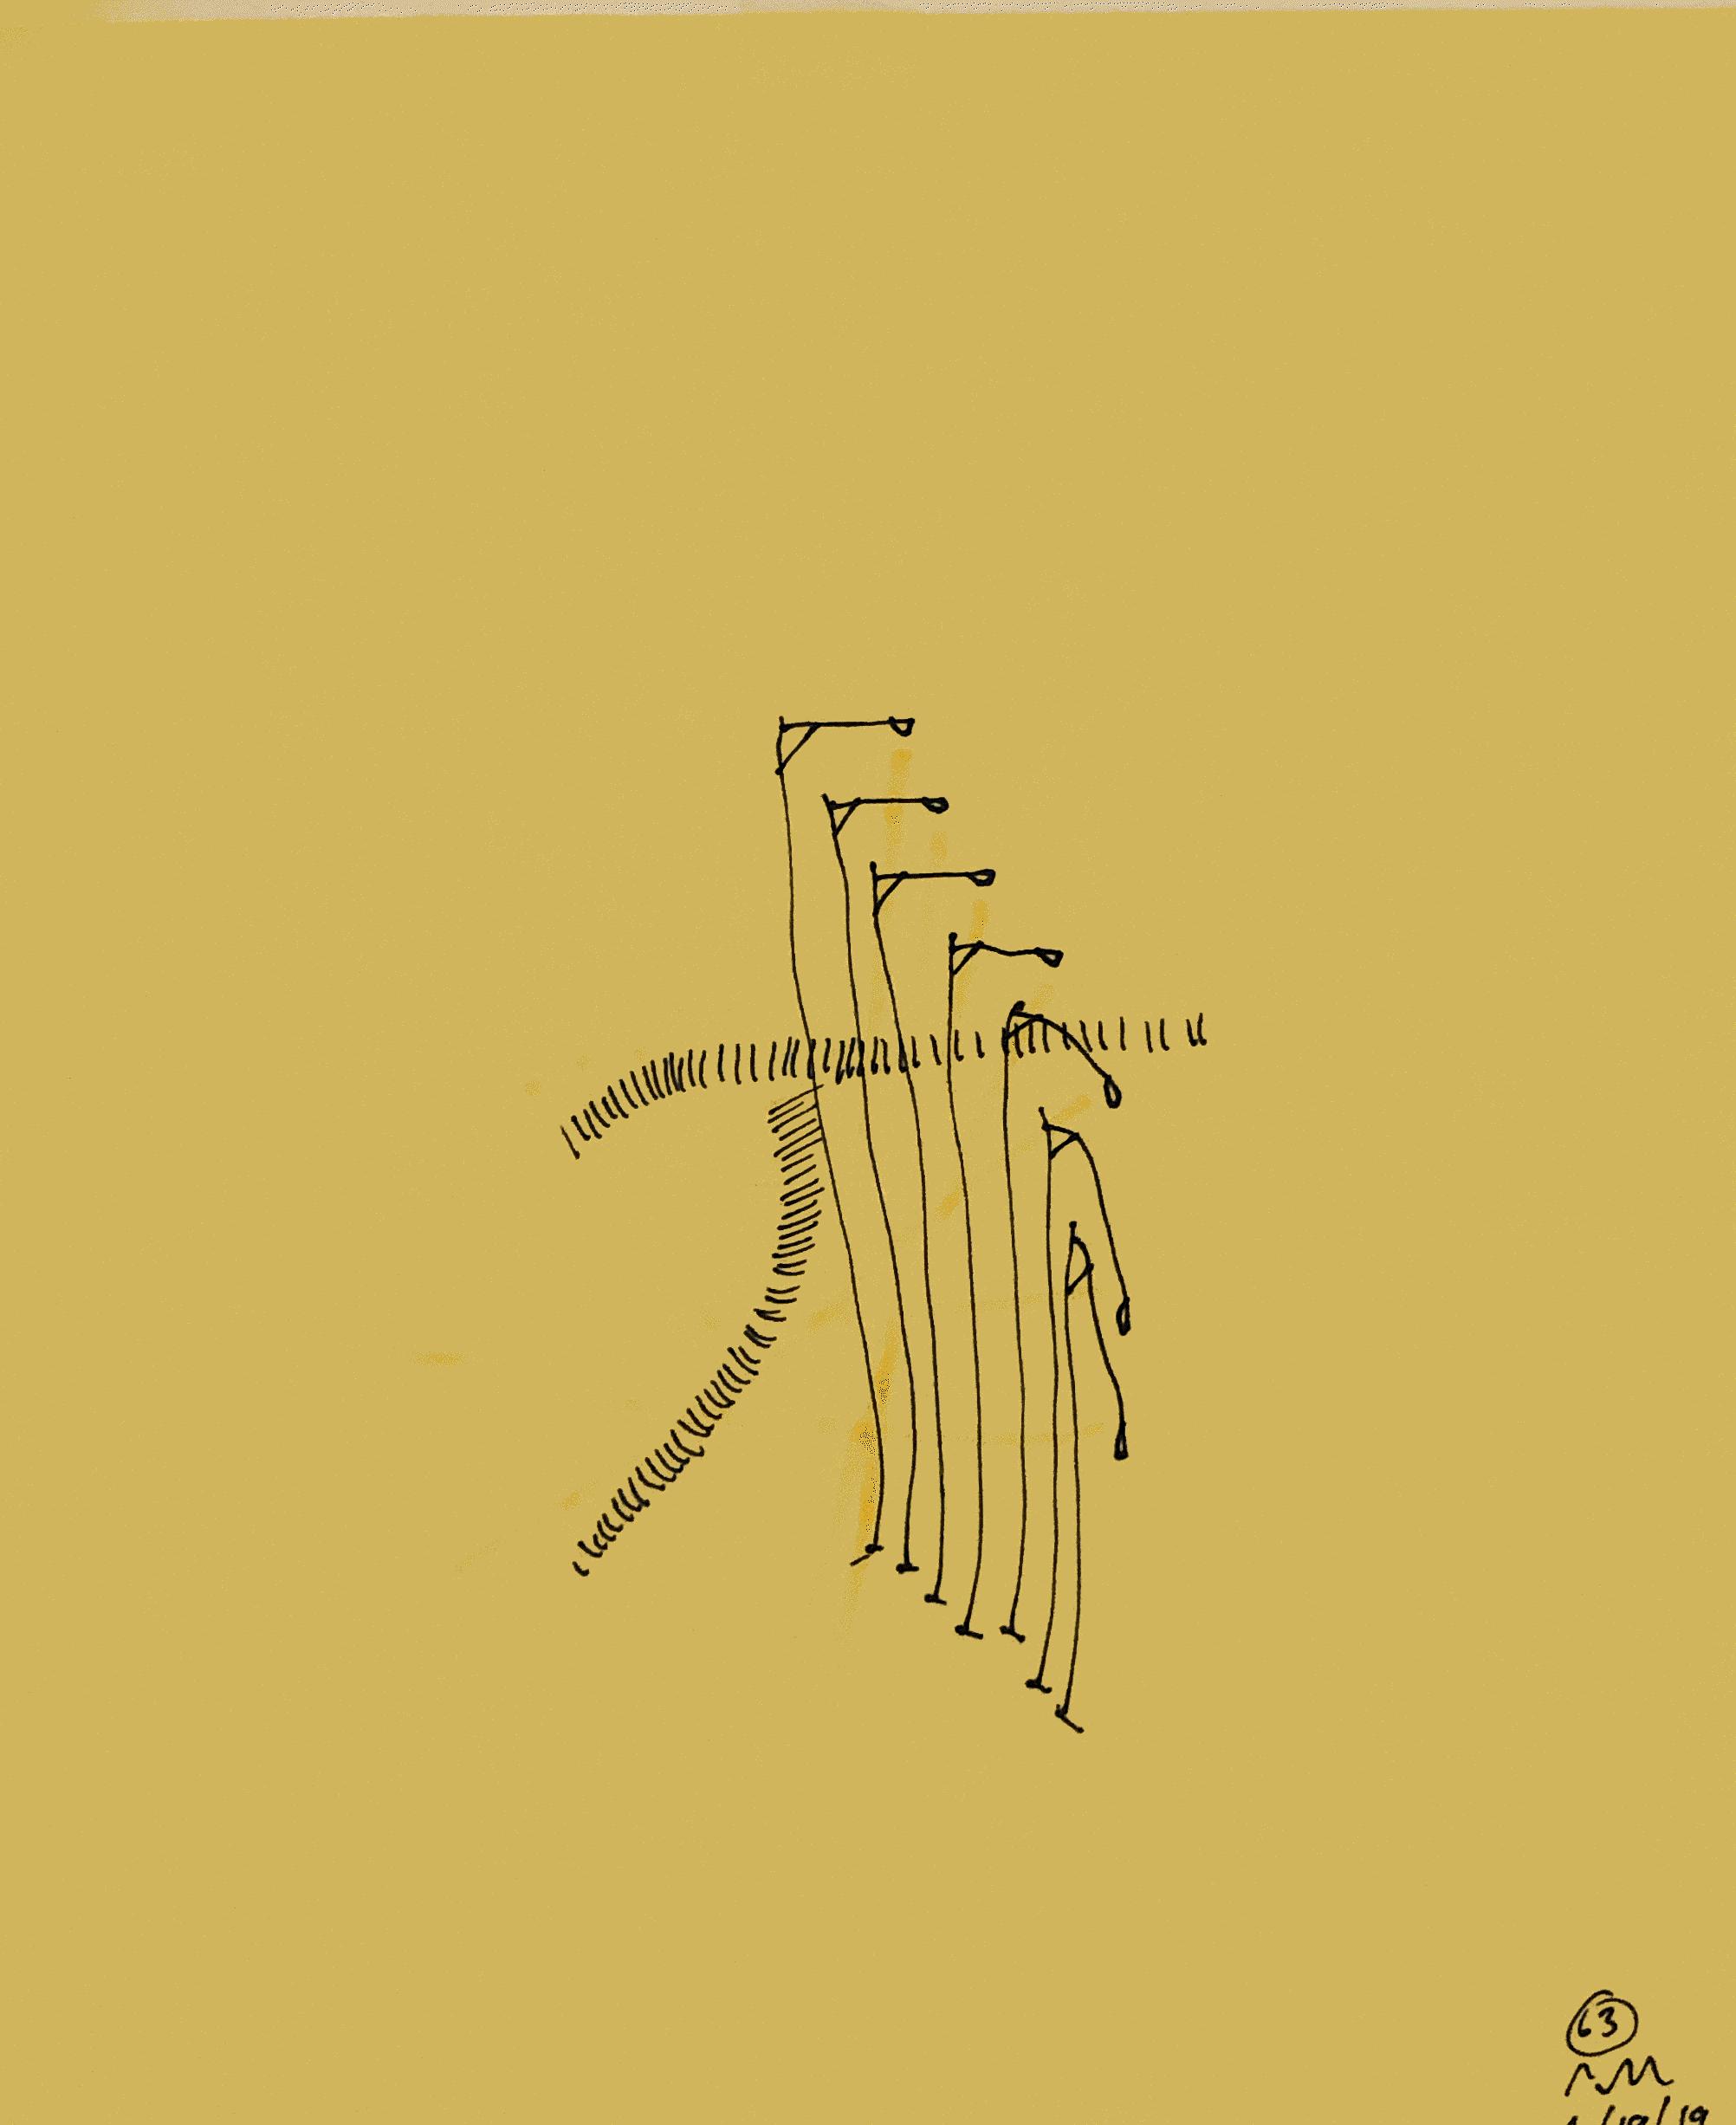 institutional residency drawing ryan meyer art